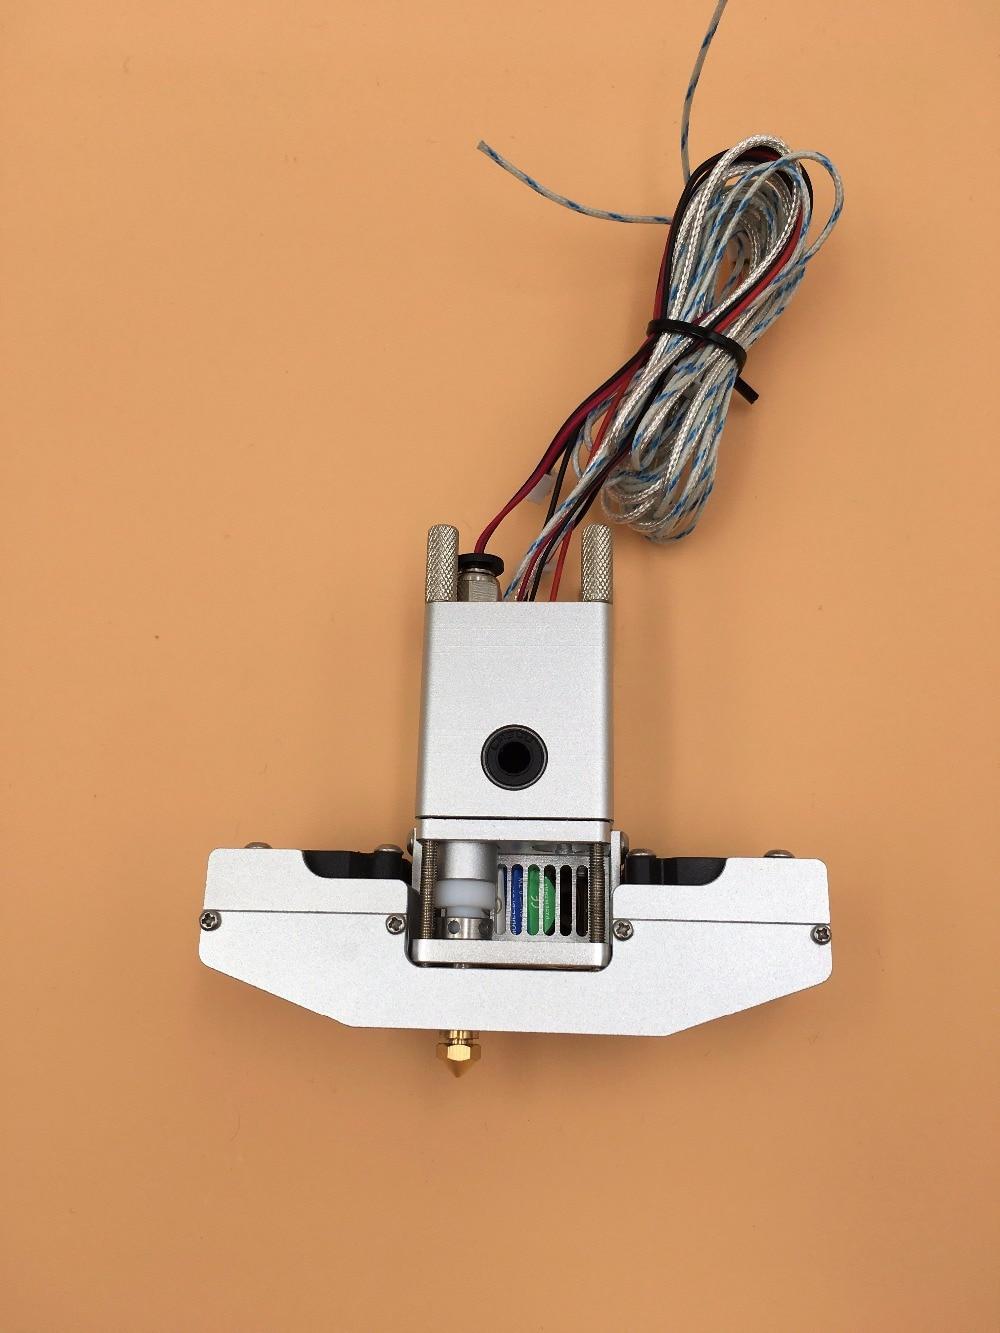 Blurolls Ultimaker 2 + 3d Impresora Hot End Kit Completo De Aluminio 1,75/3mm Olsson Bloque Y Boquilla Pt100 Sensor Y Cartucho De Calentador